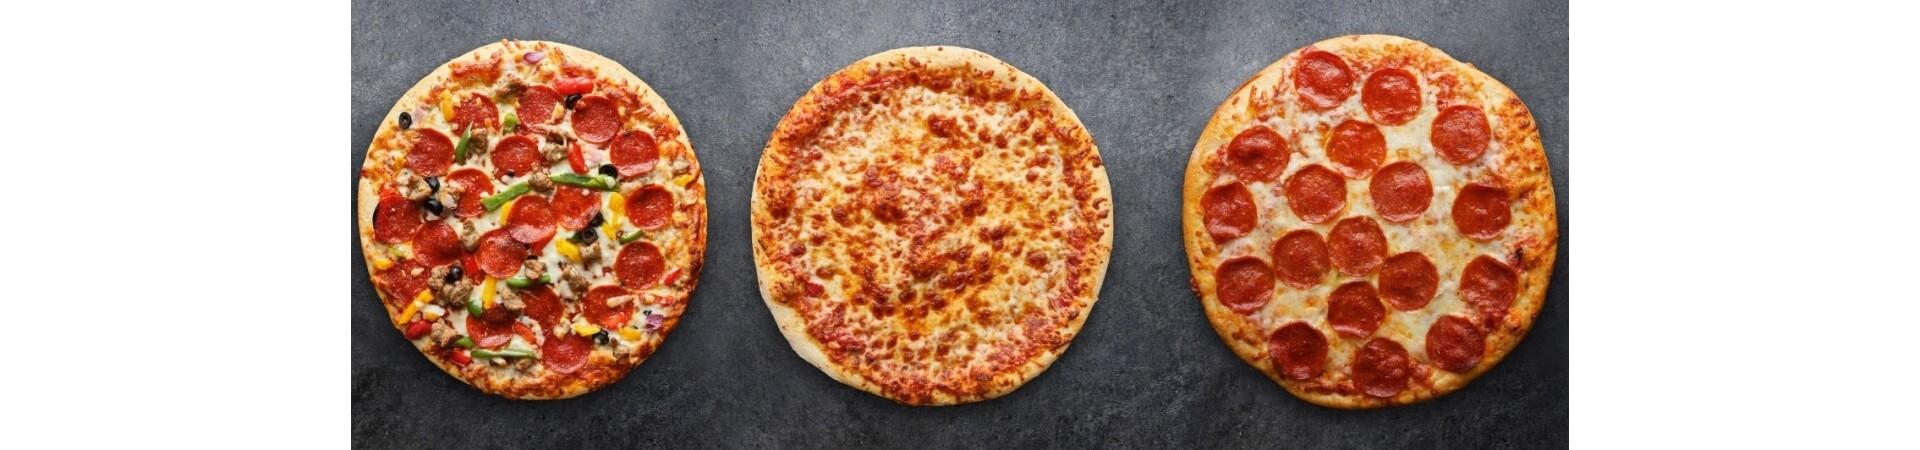 КОМБО из 3 пицц за 999 руб.